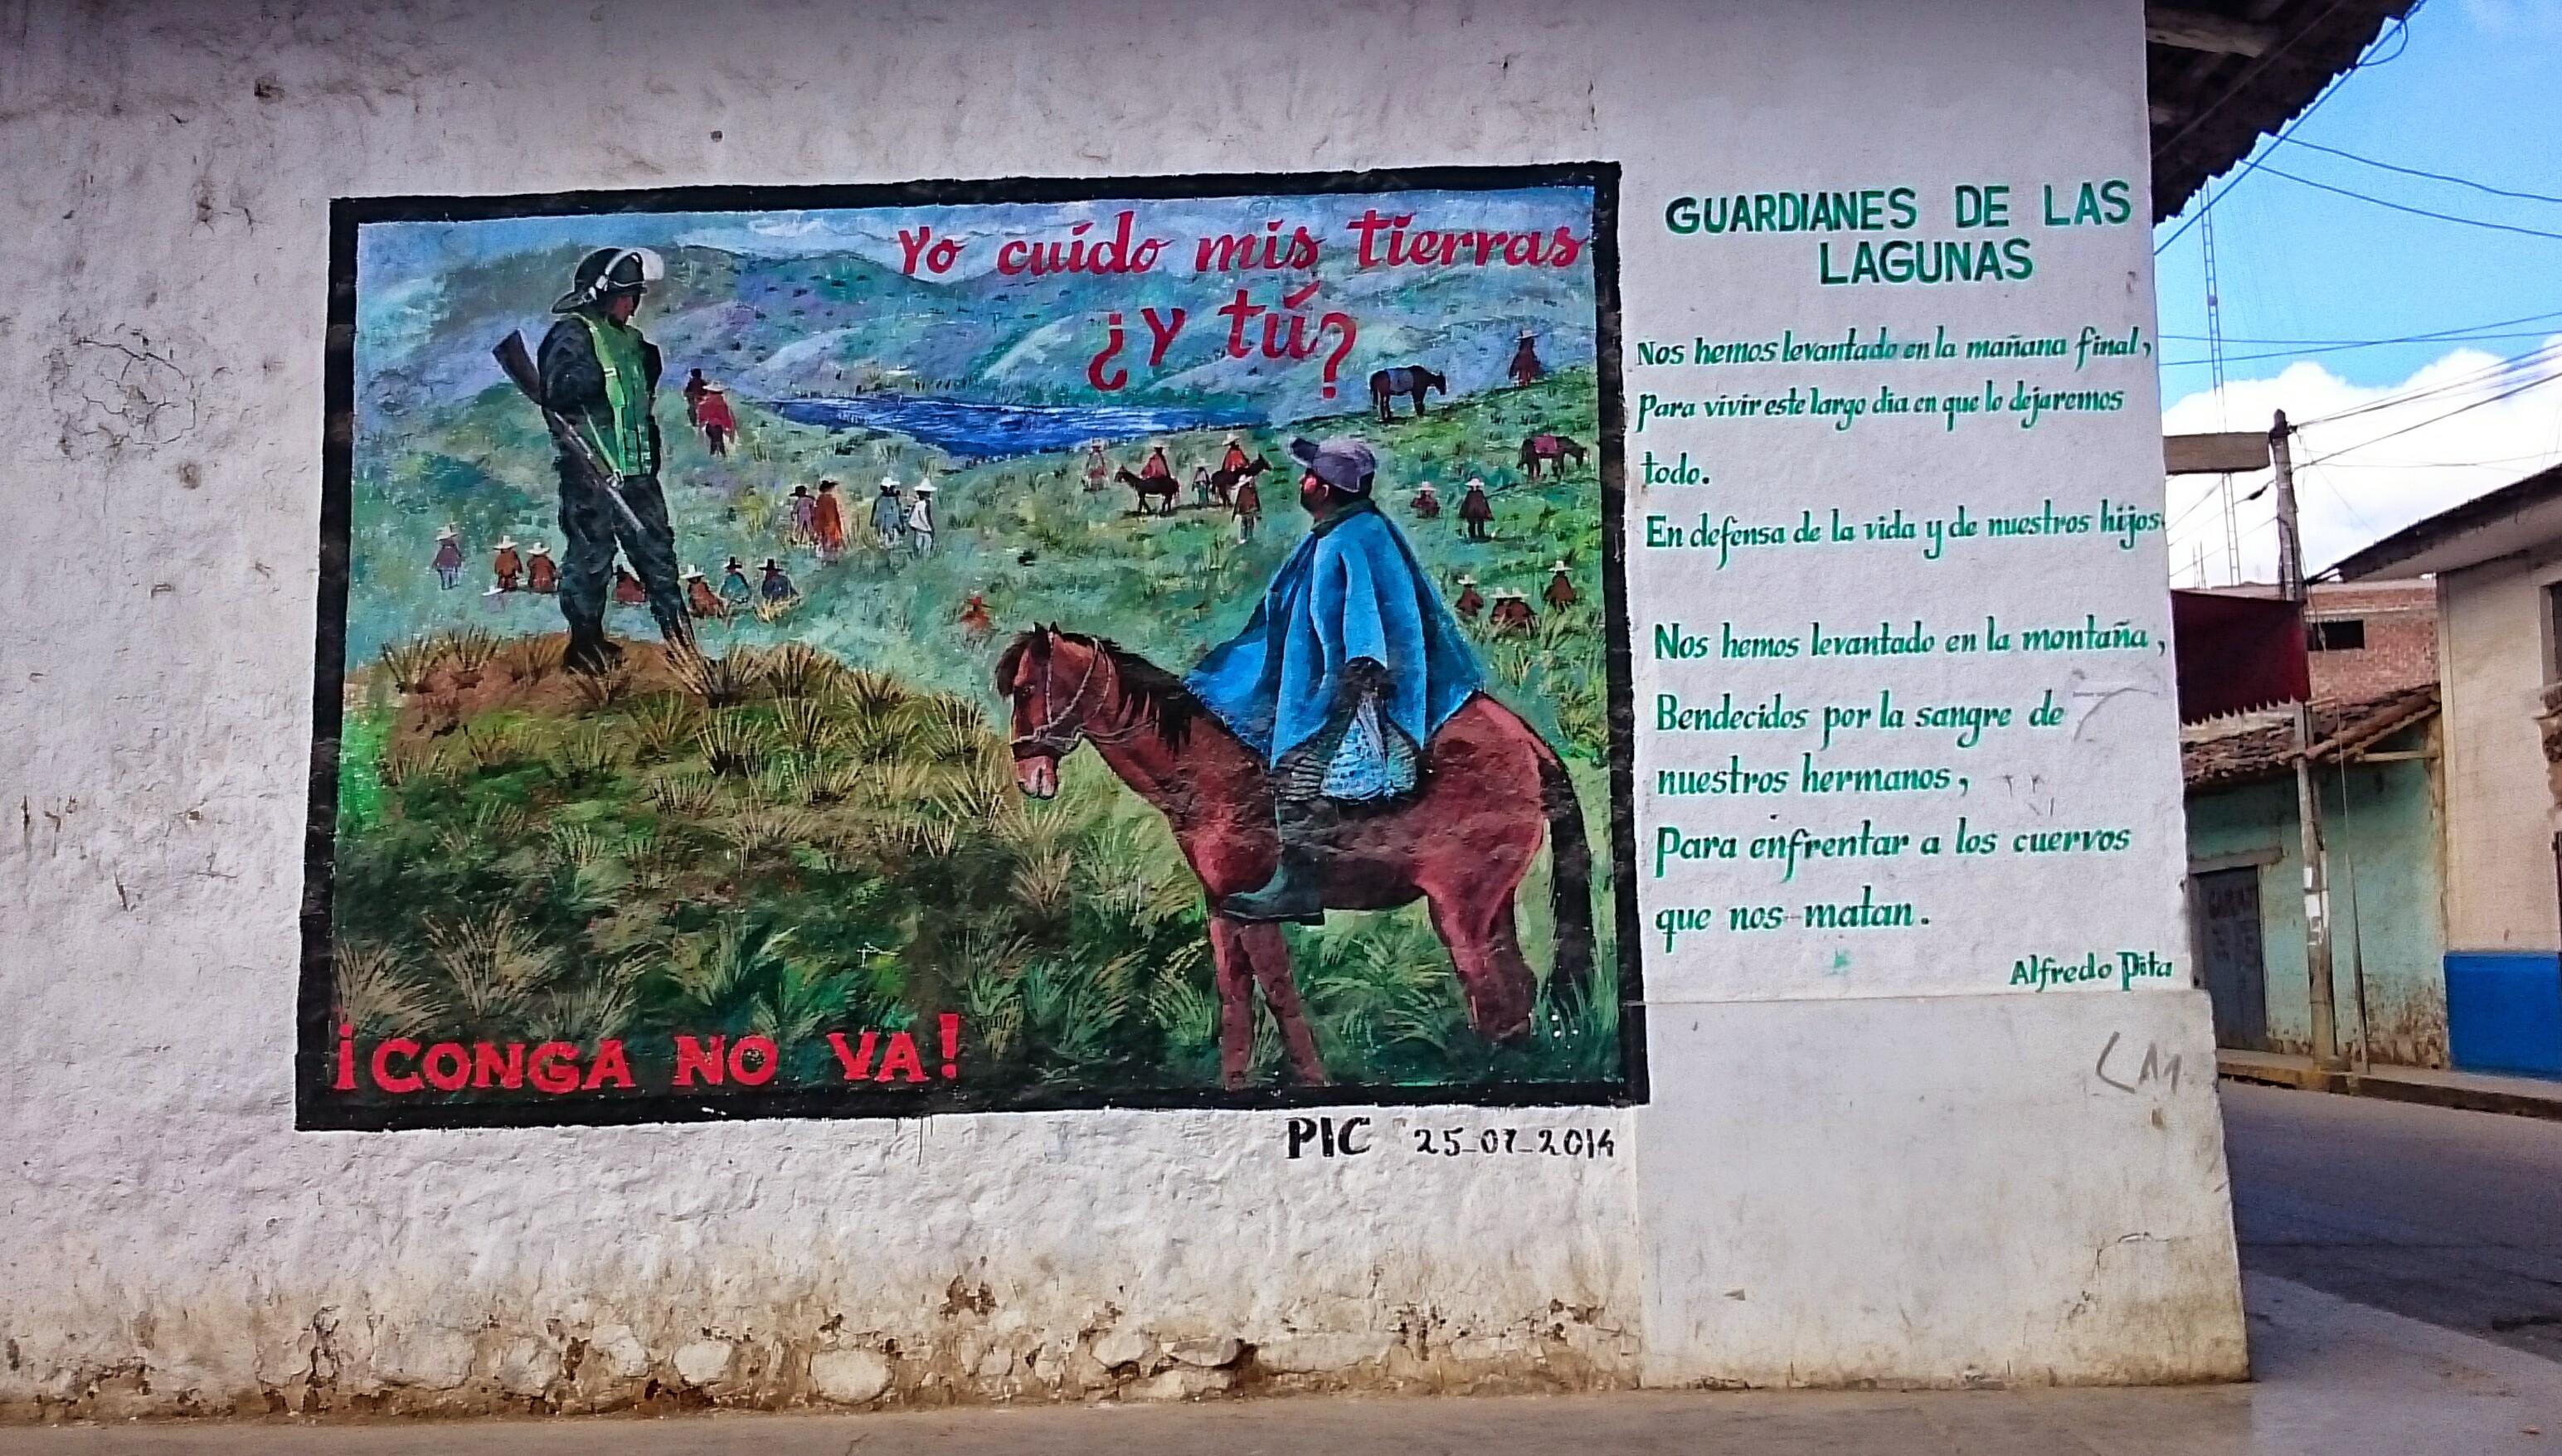 Pérou: Une lueur d'espoir dans la lutte contre le méga projet minier Conga. Perú: Una luz de esperanza en la lucha contra el mega proyecto minero Conga.